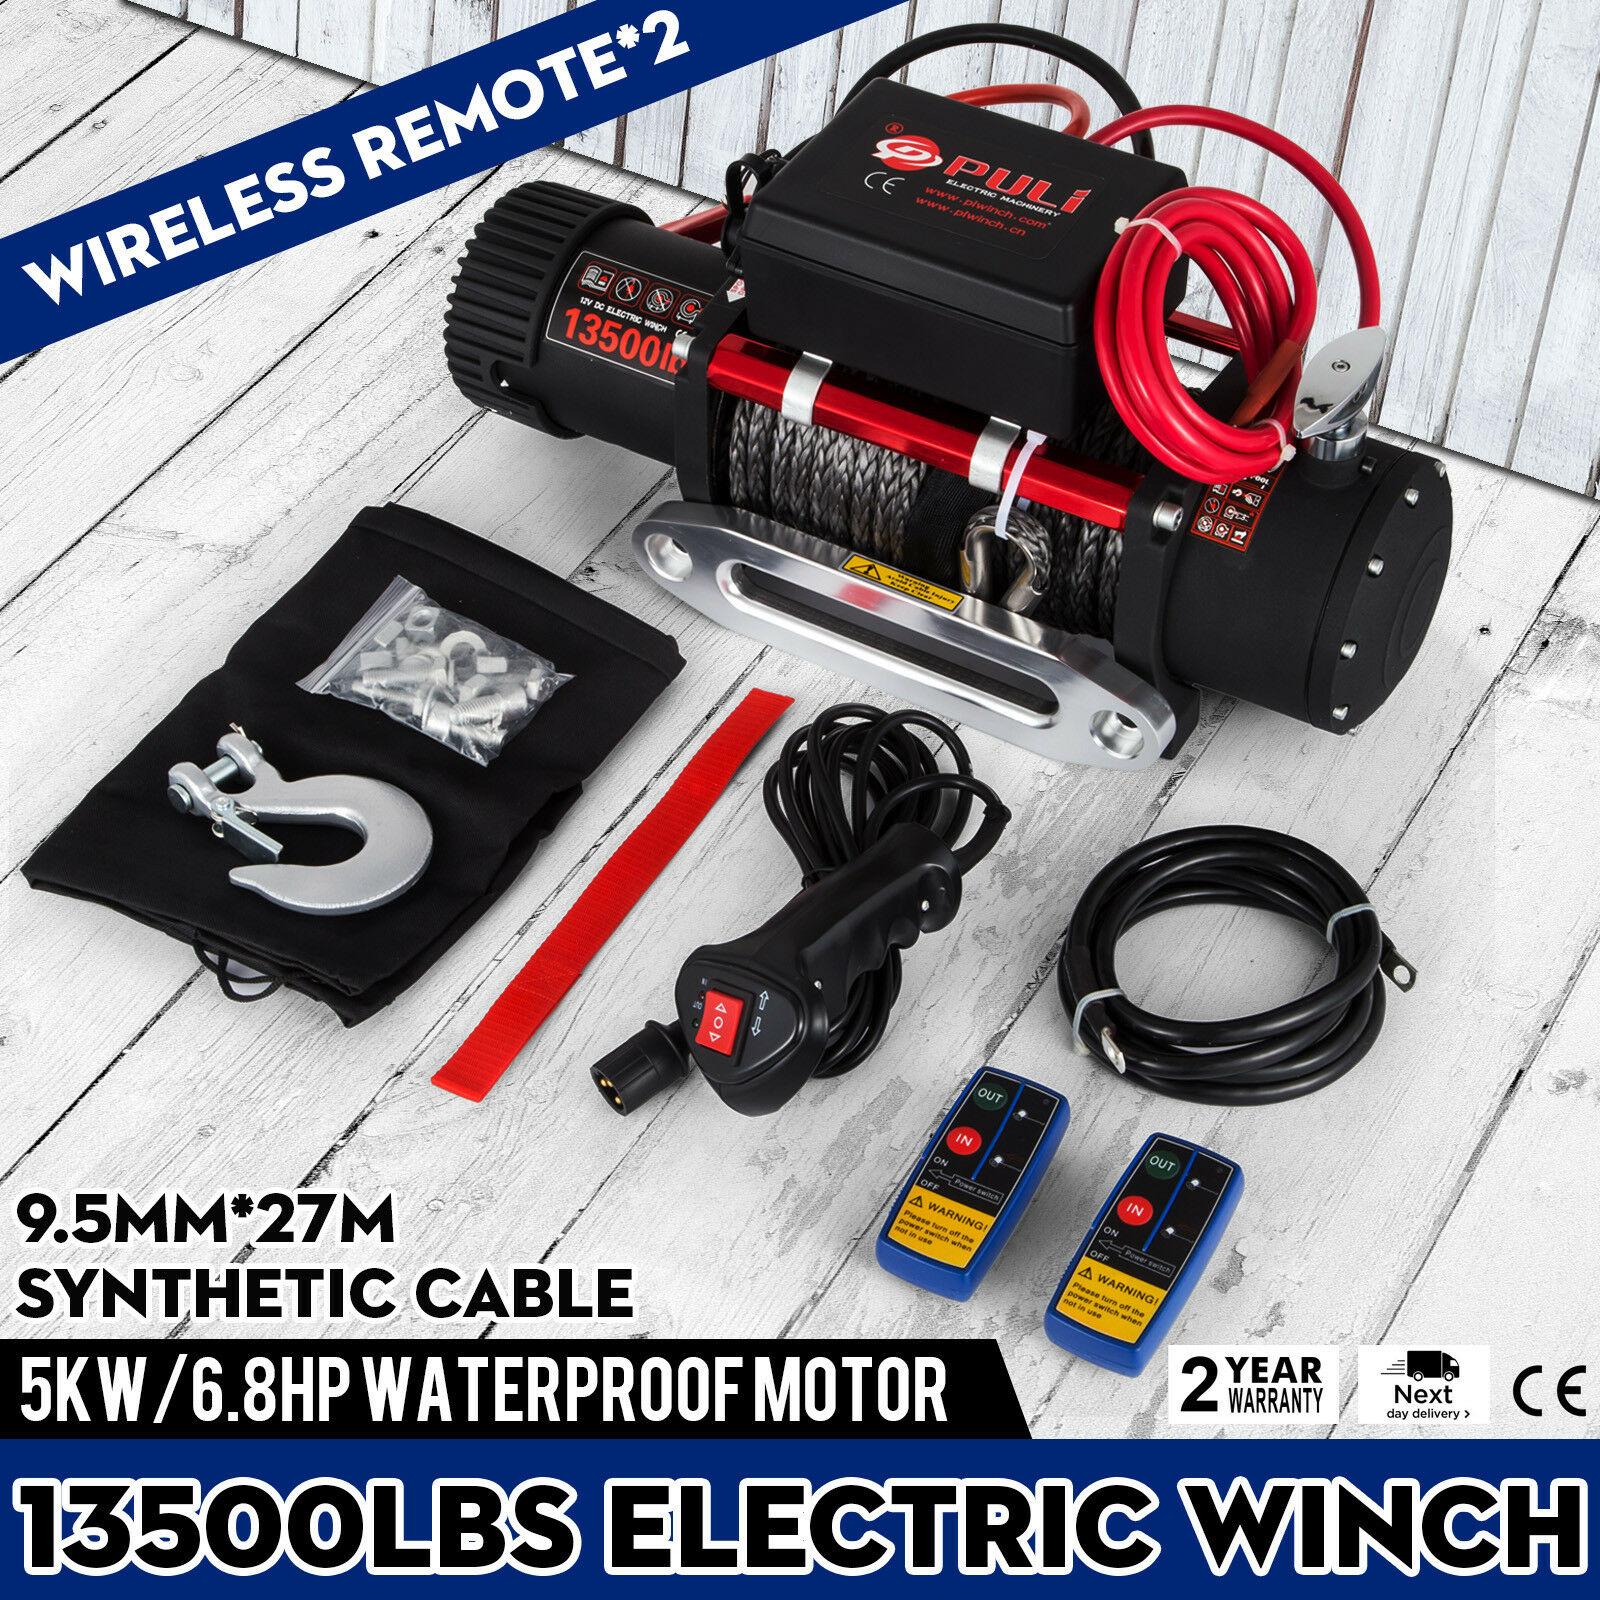 Elektrische Synthetik Seilwinde 12V 6123.5KG 13500lbs Roller Fairlead 6.8HP